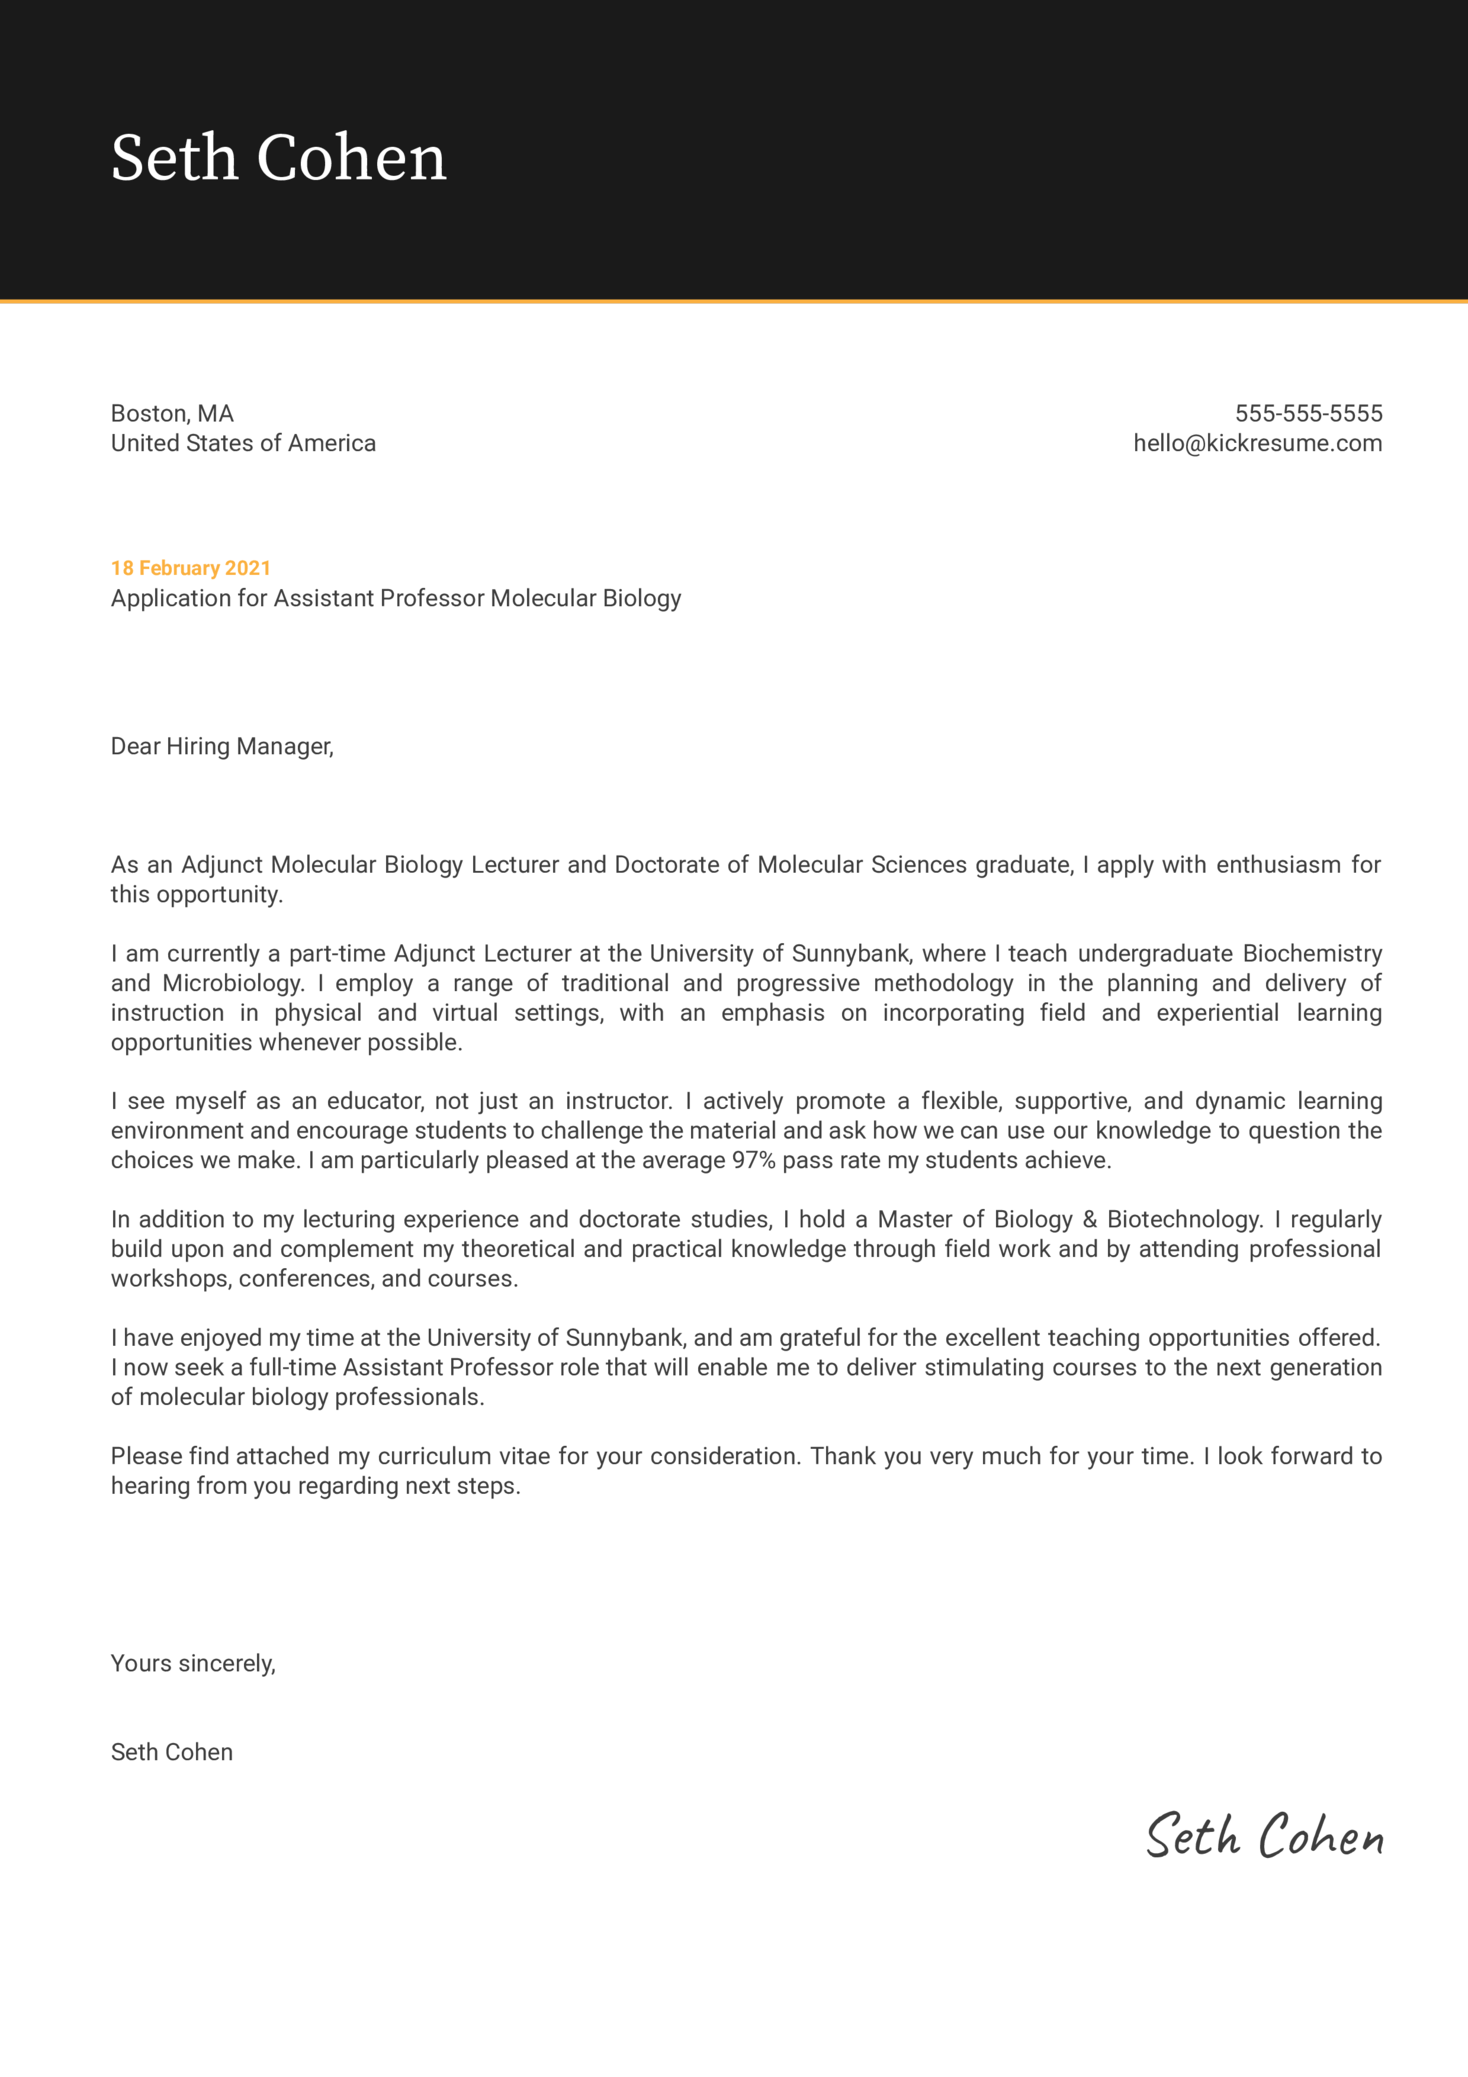 Assistant Professor Molecular Biology Cover Letter Template